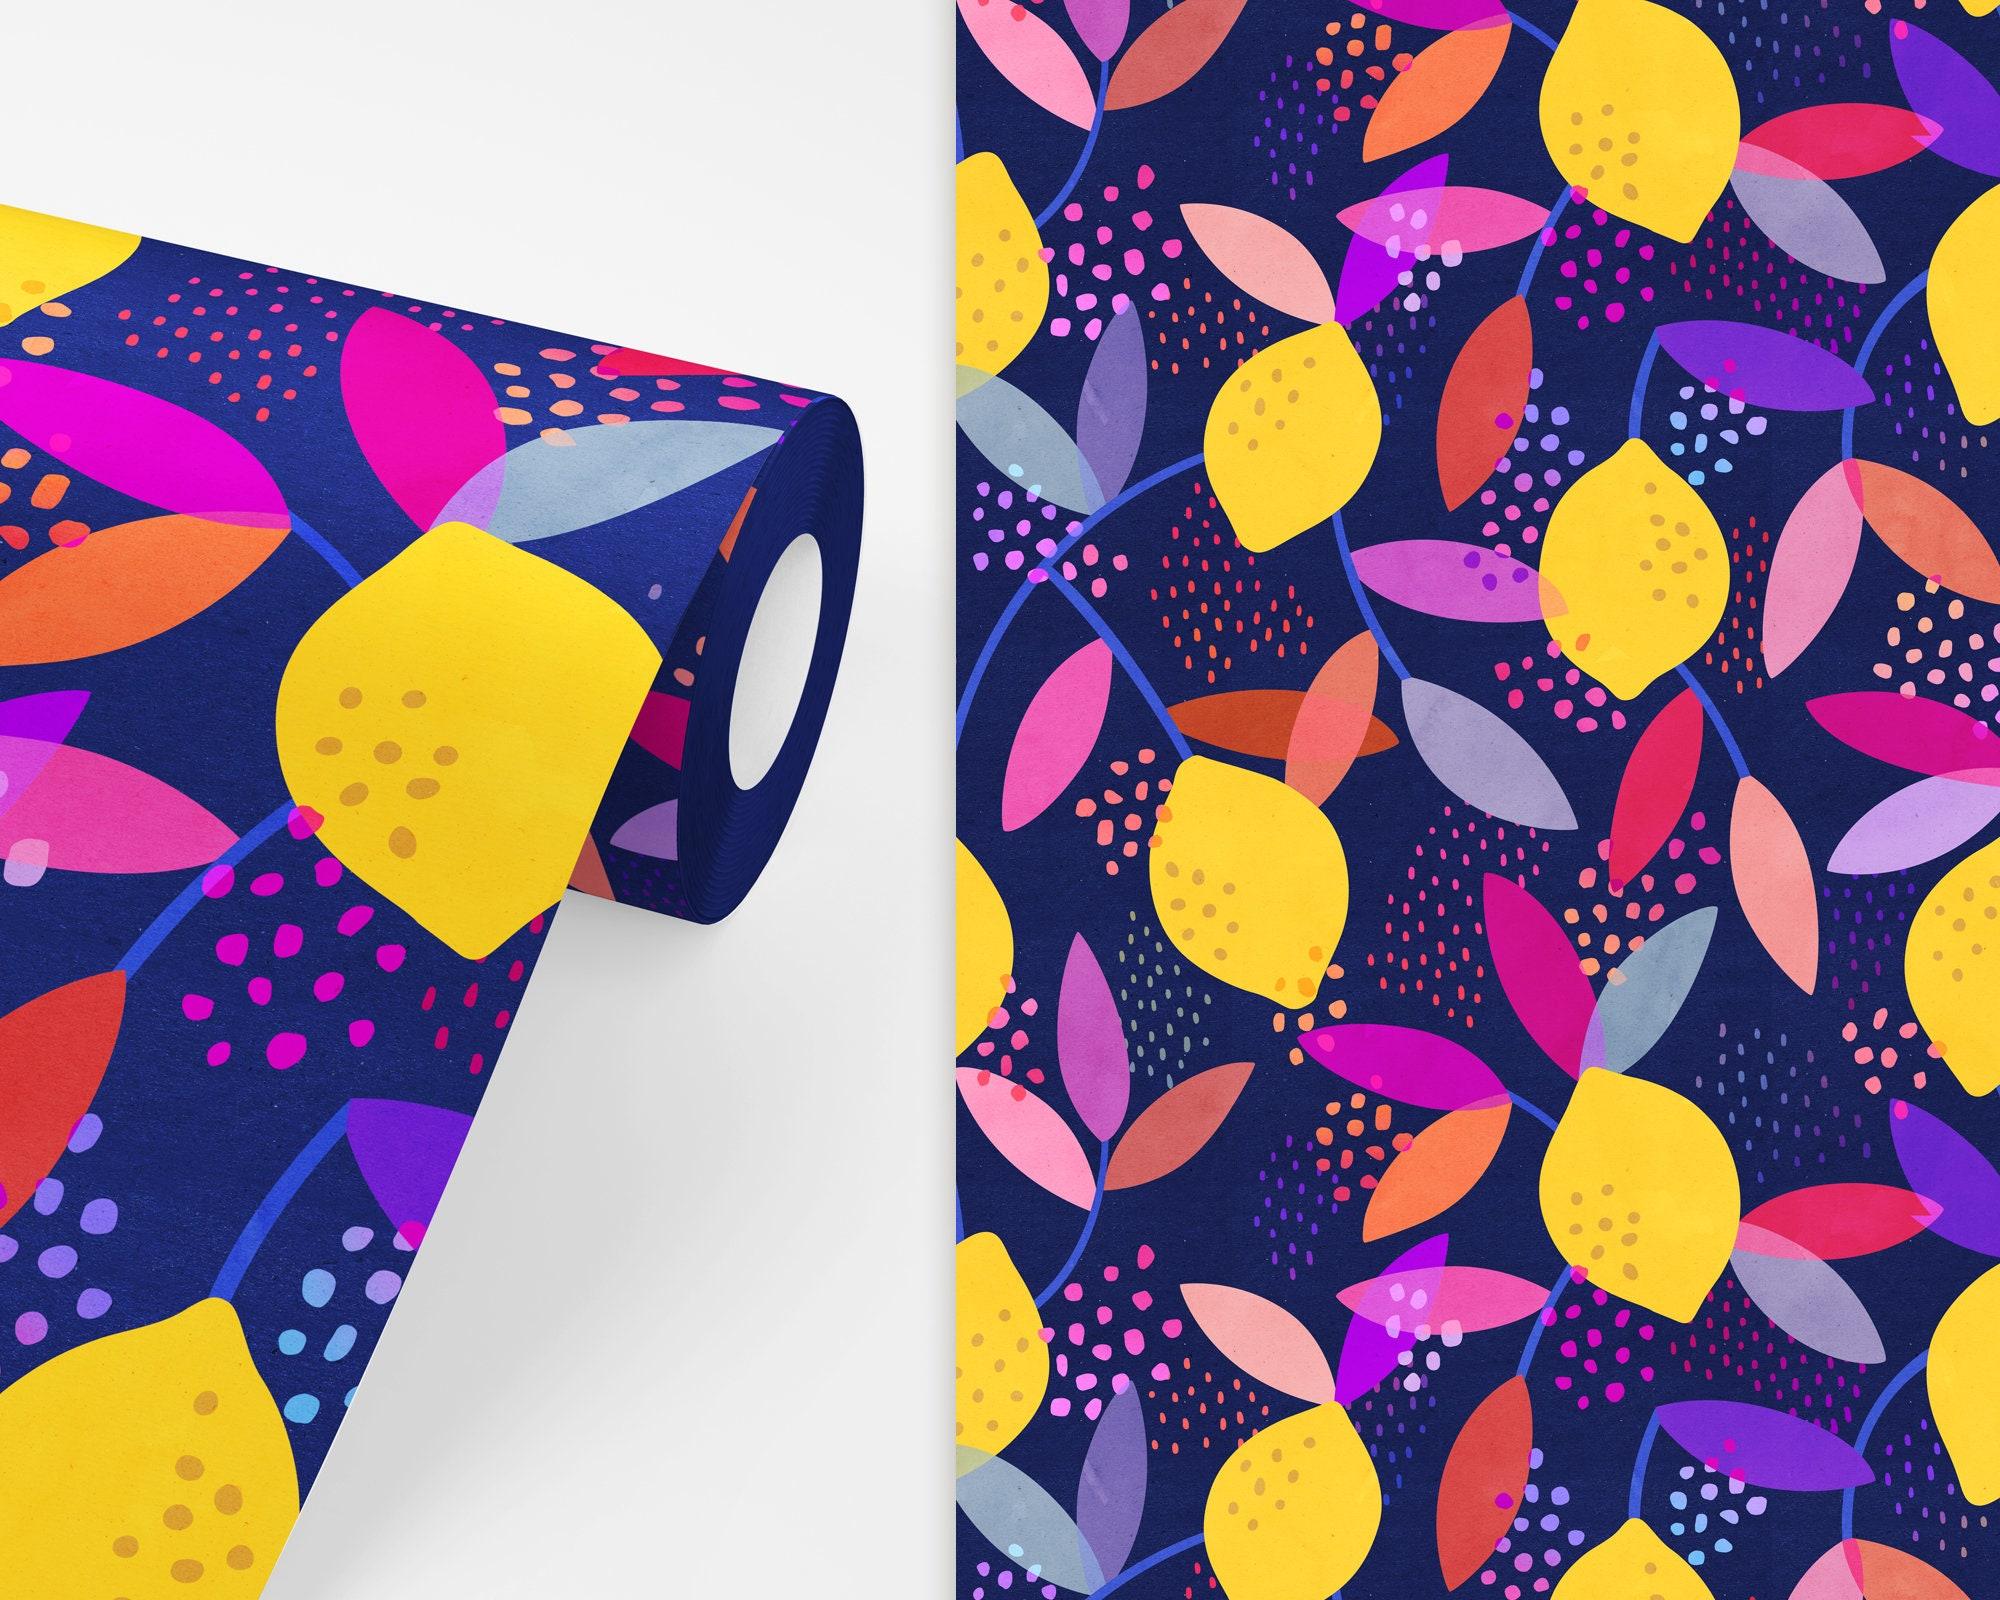 Lemon Floral Wallpaper Peel And Stick Removable Wallpaper